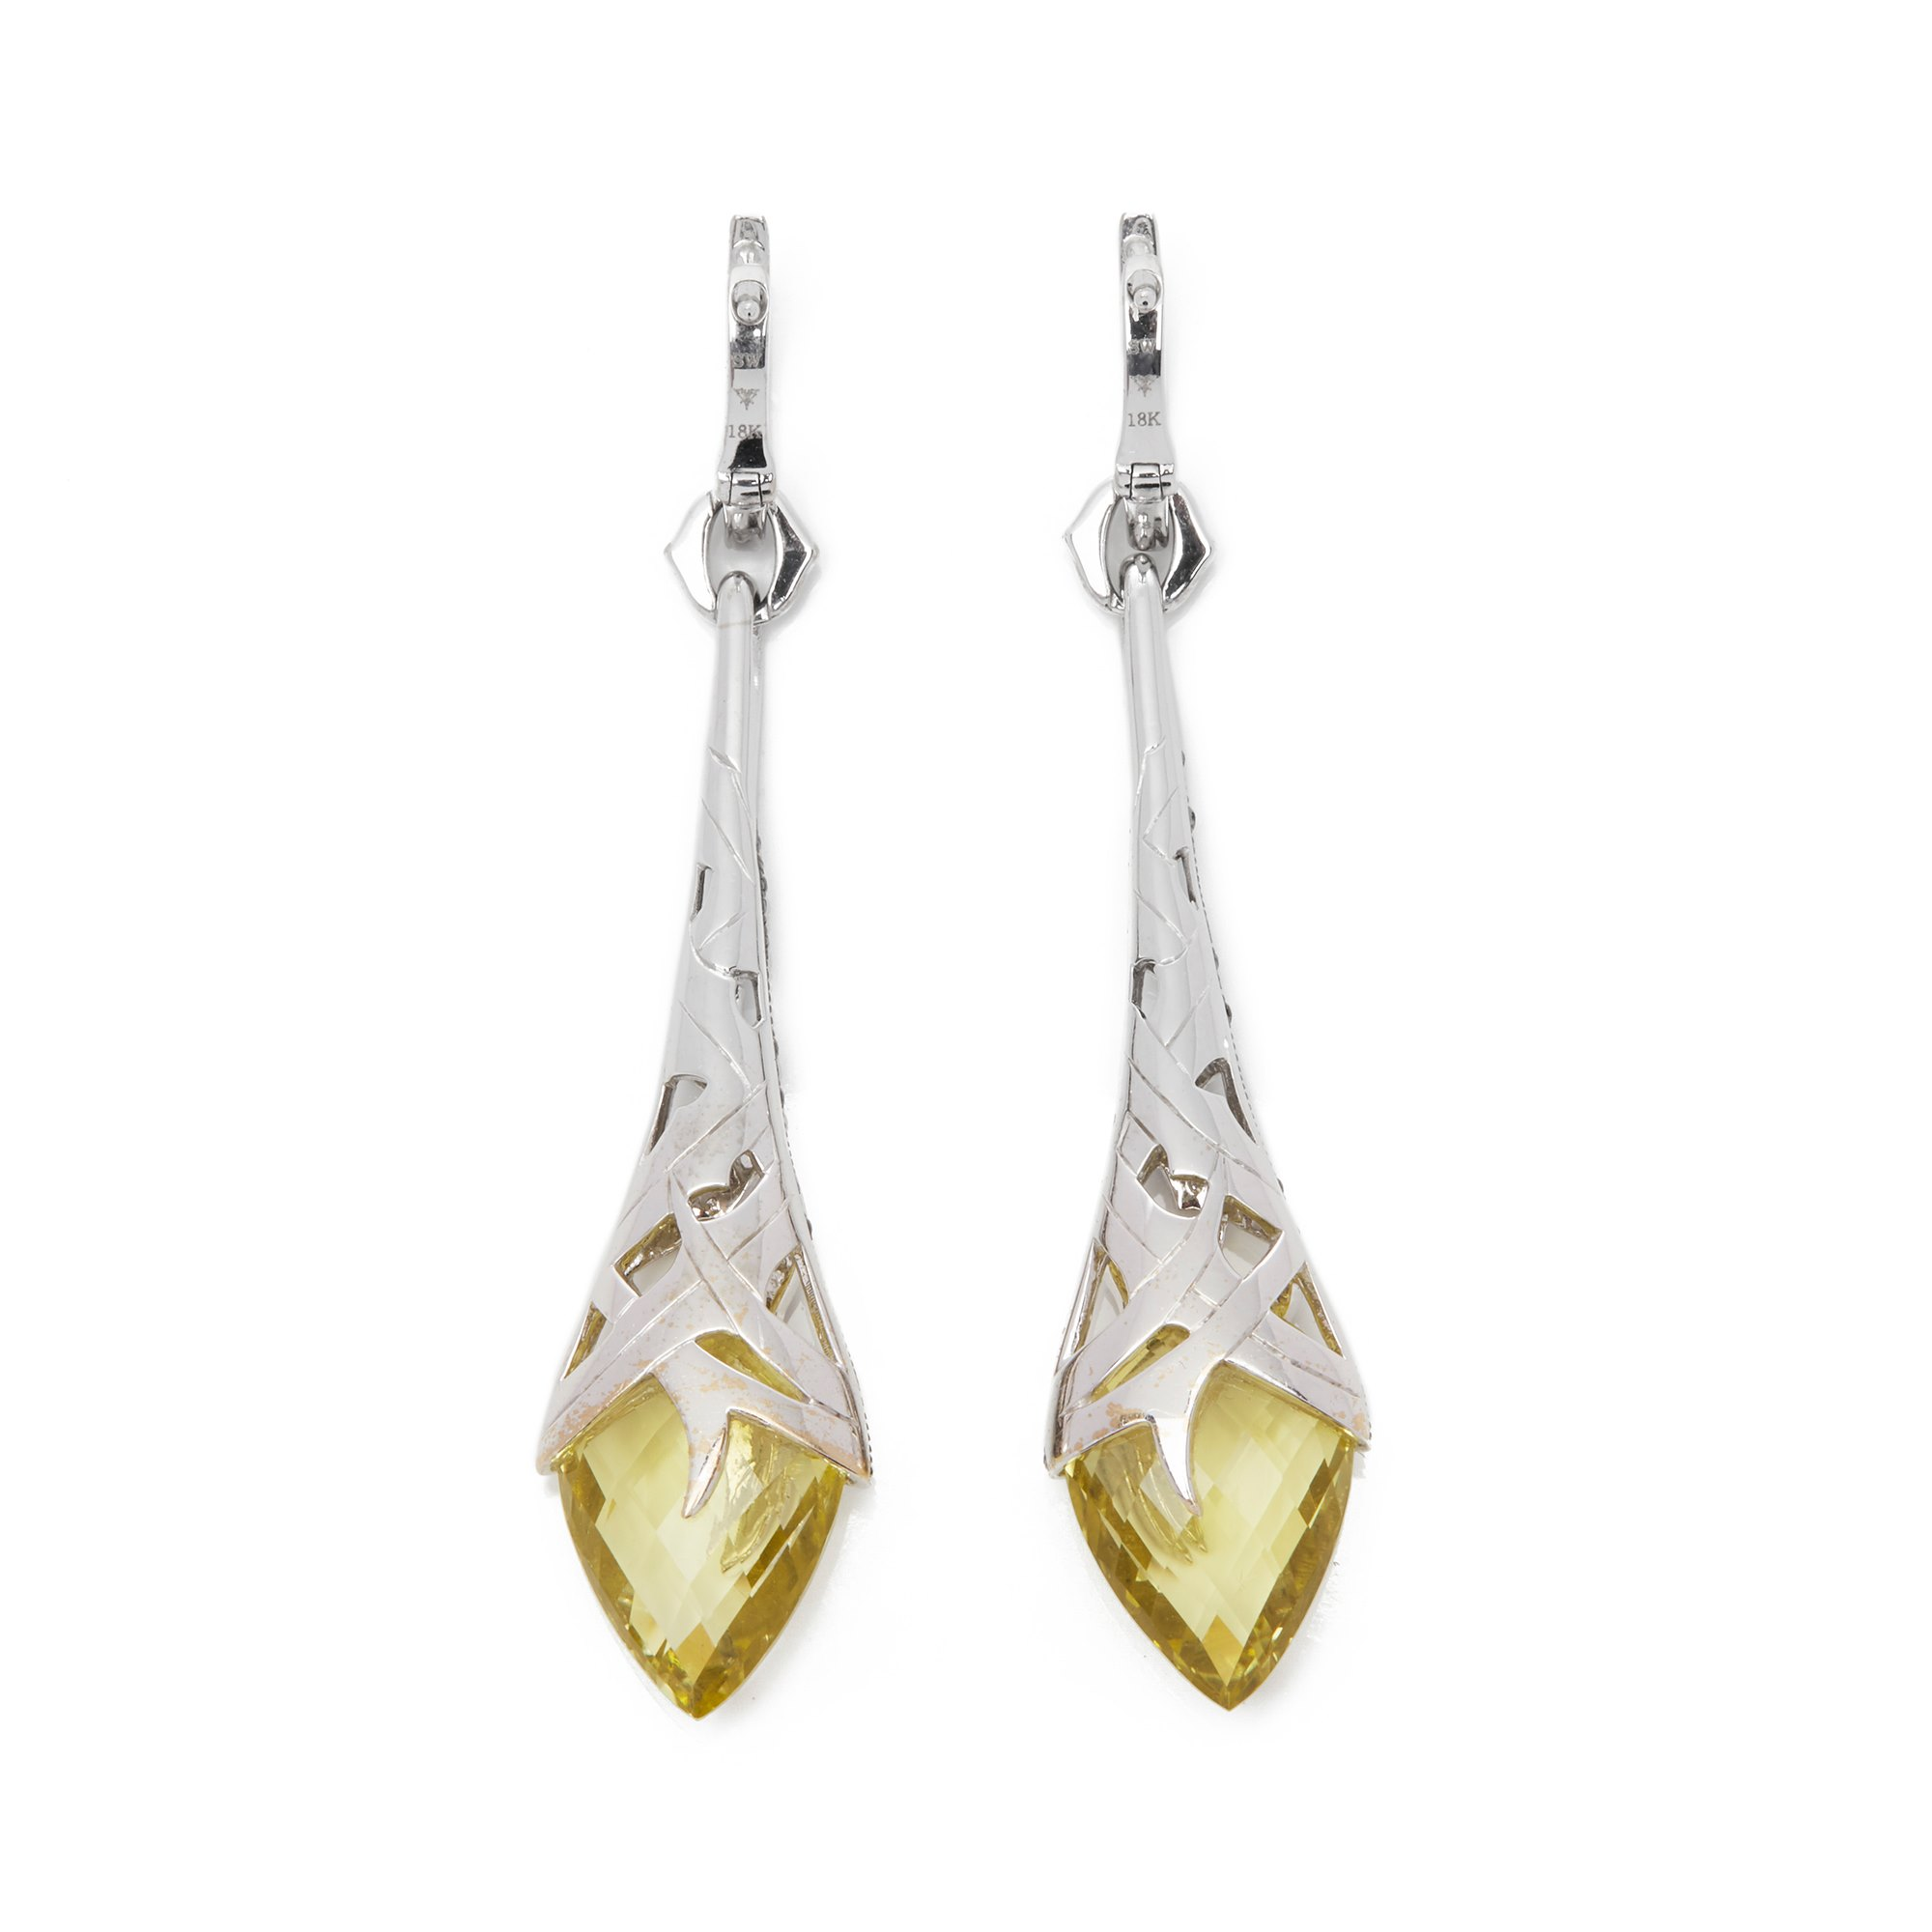 Stephen Webster Thorn 18ct White Gold Oriverdi and Black Diamond Drop Earrings